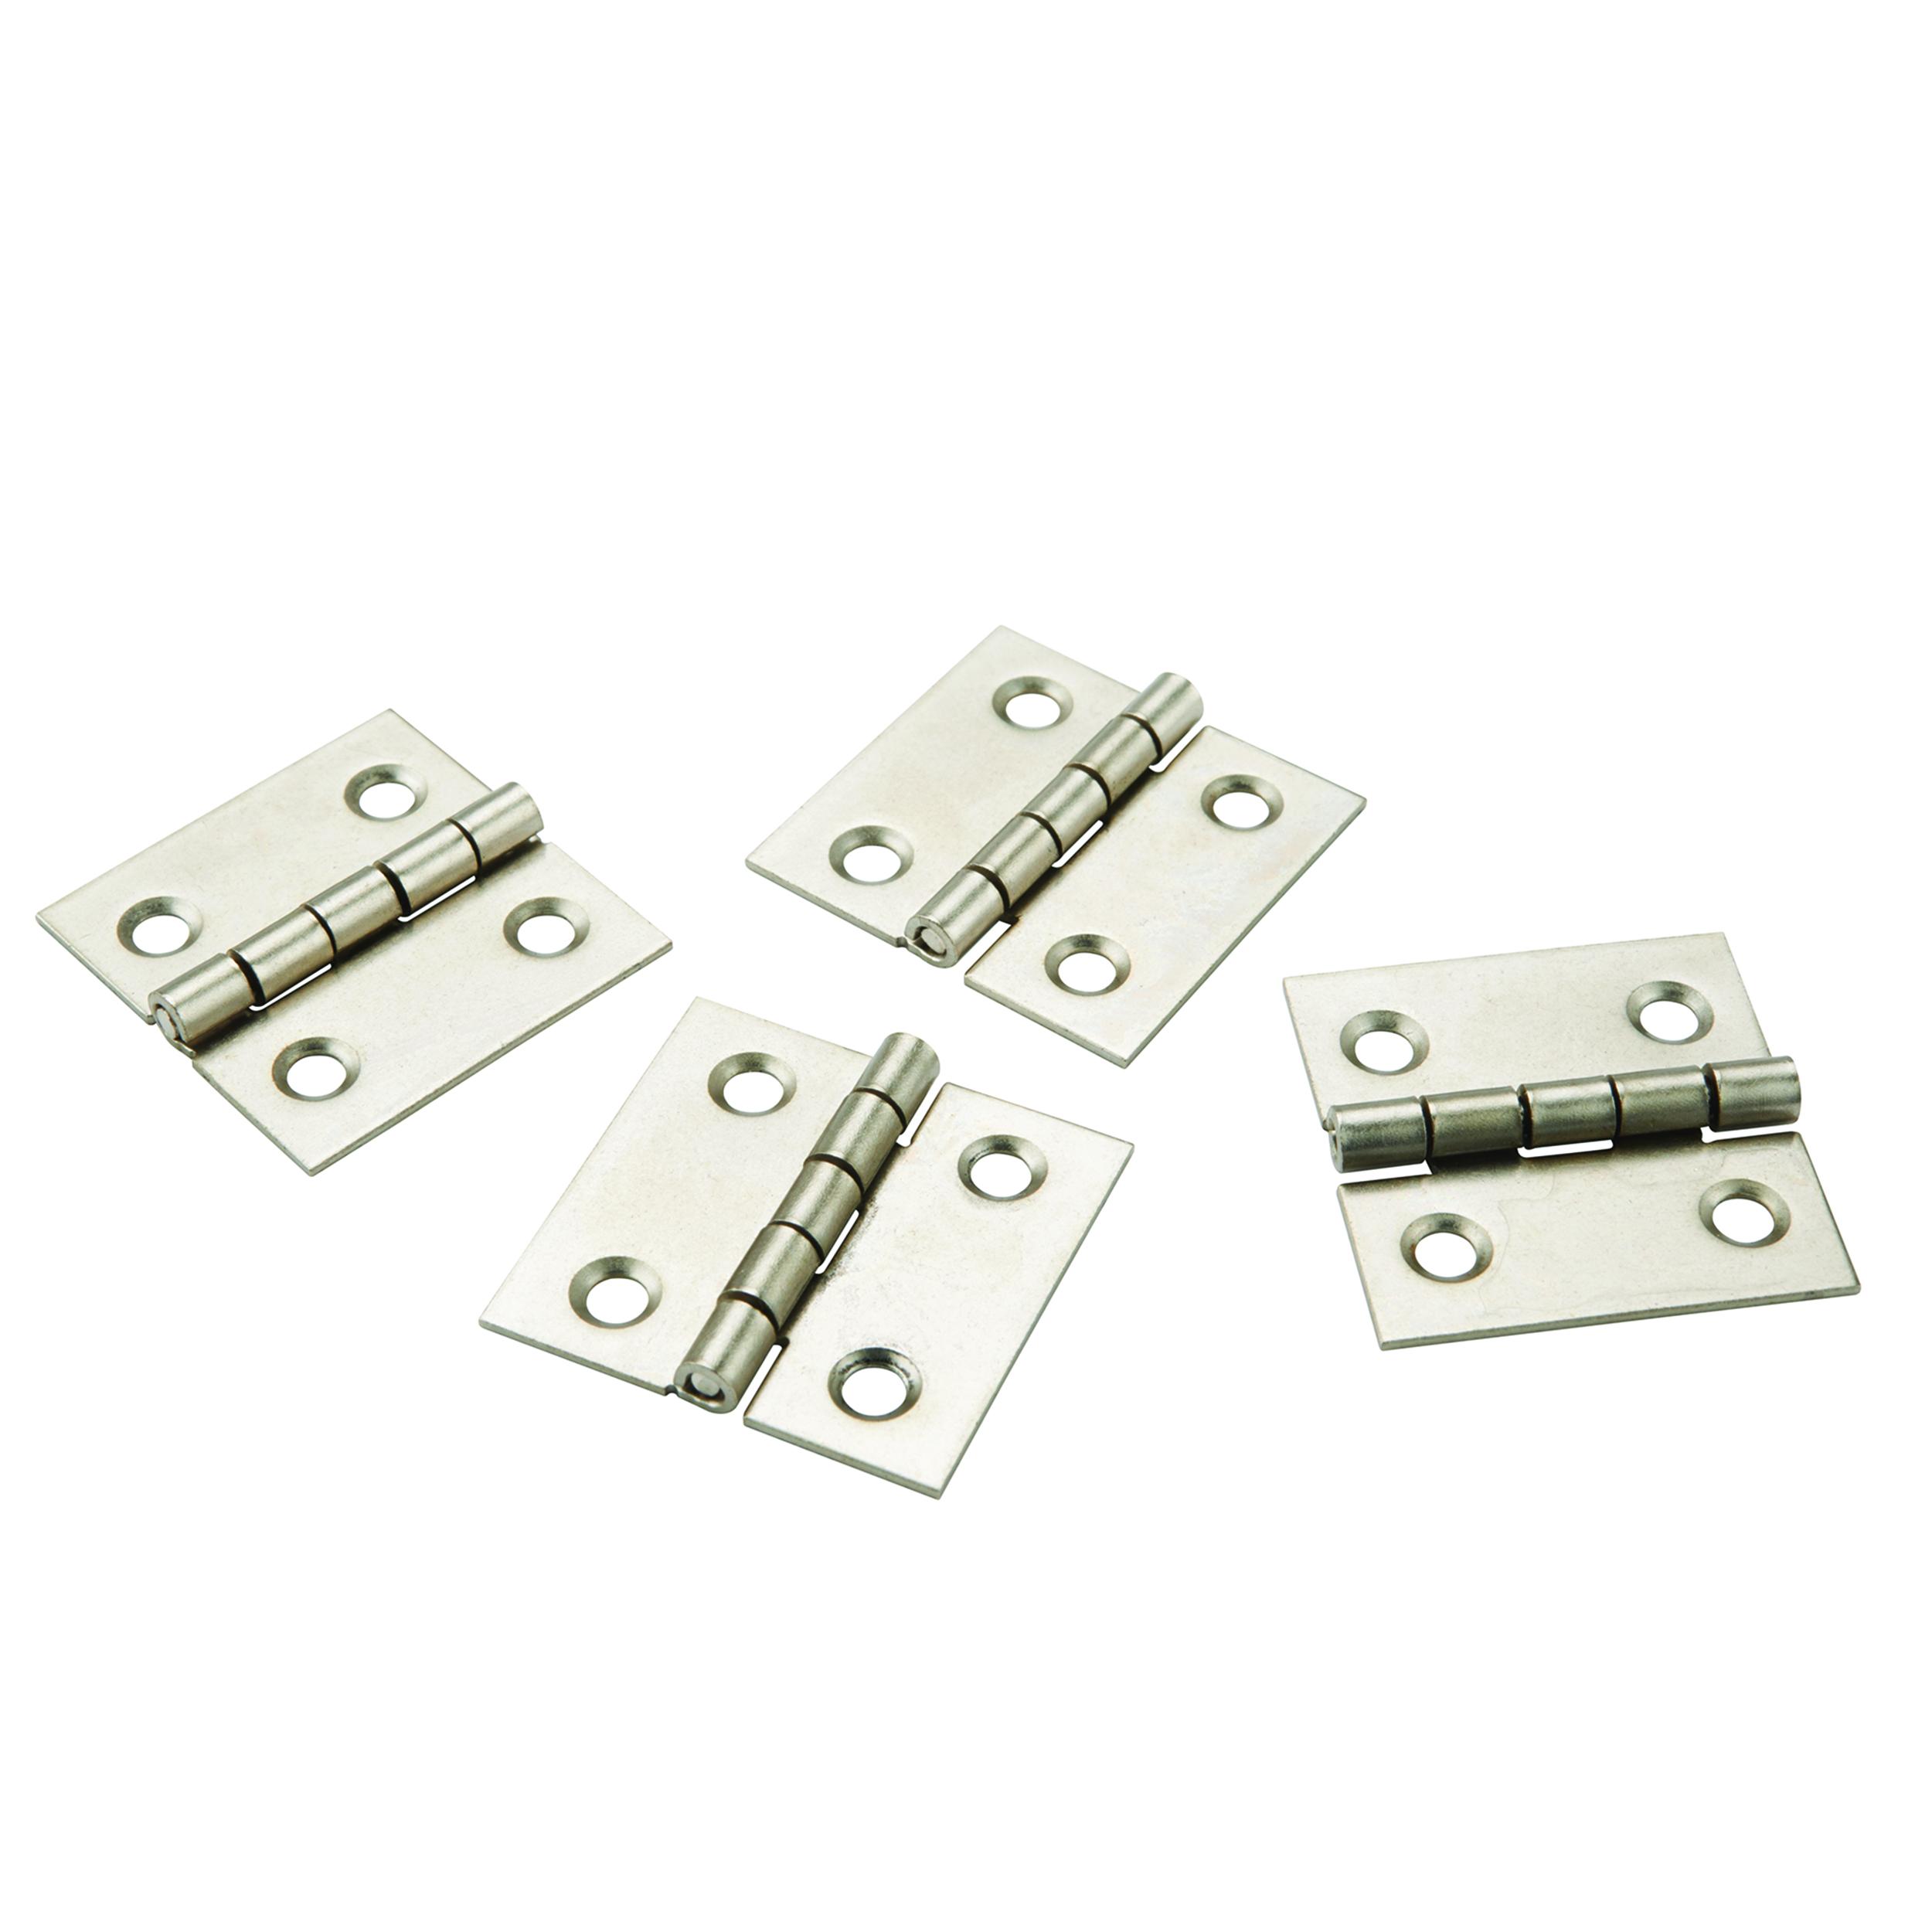 Miniature Narrow Satin Nickel Hinge 1